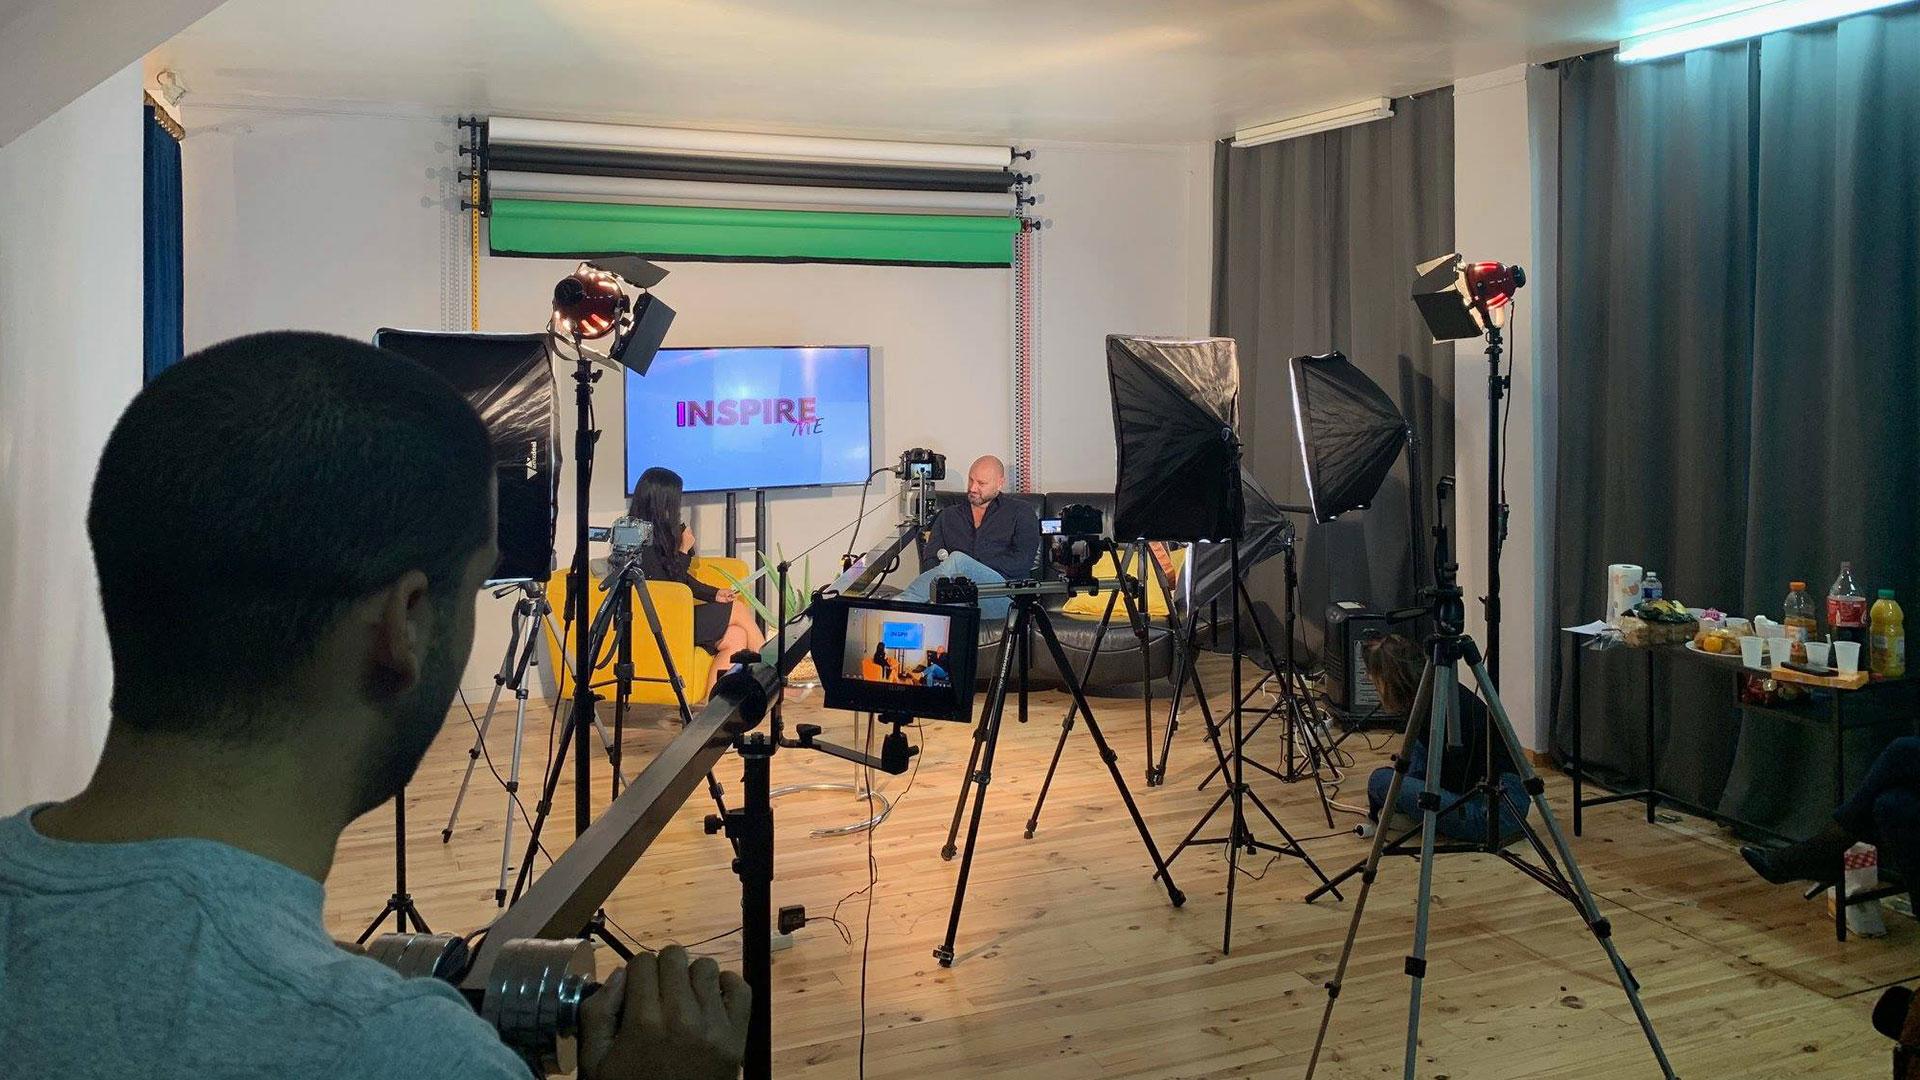 jonathan placide filmant une interview